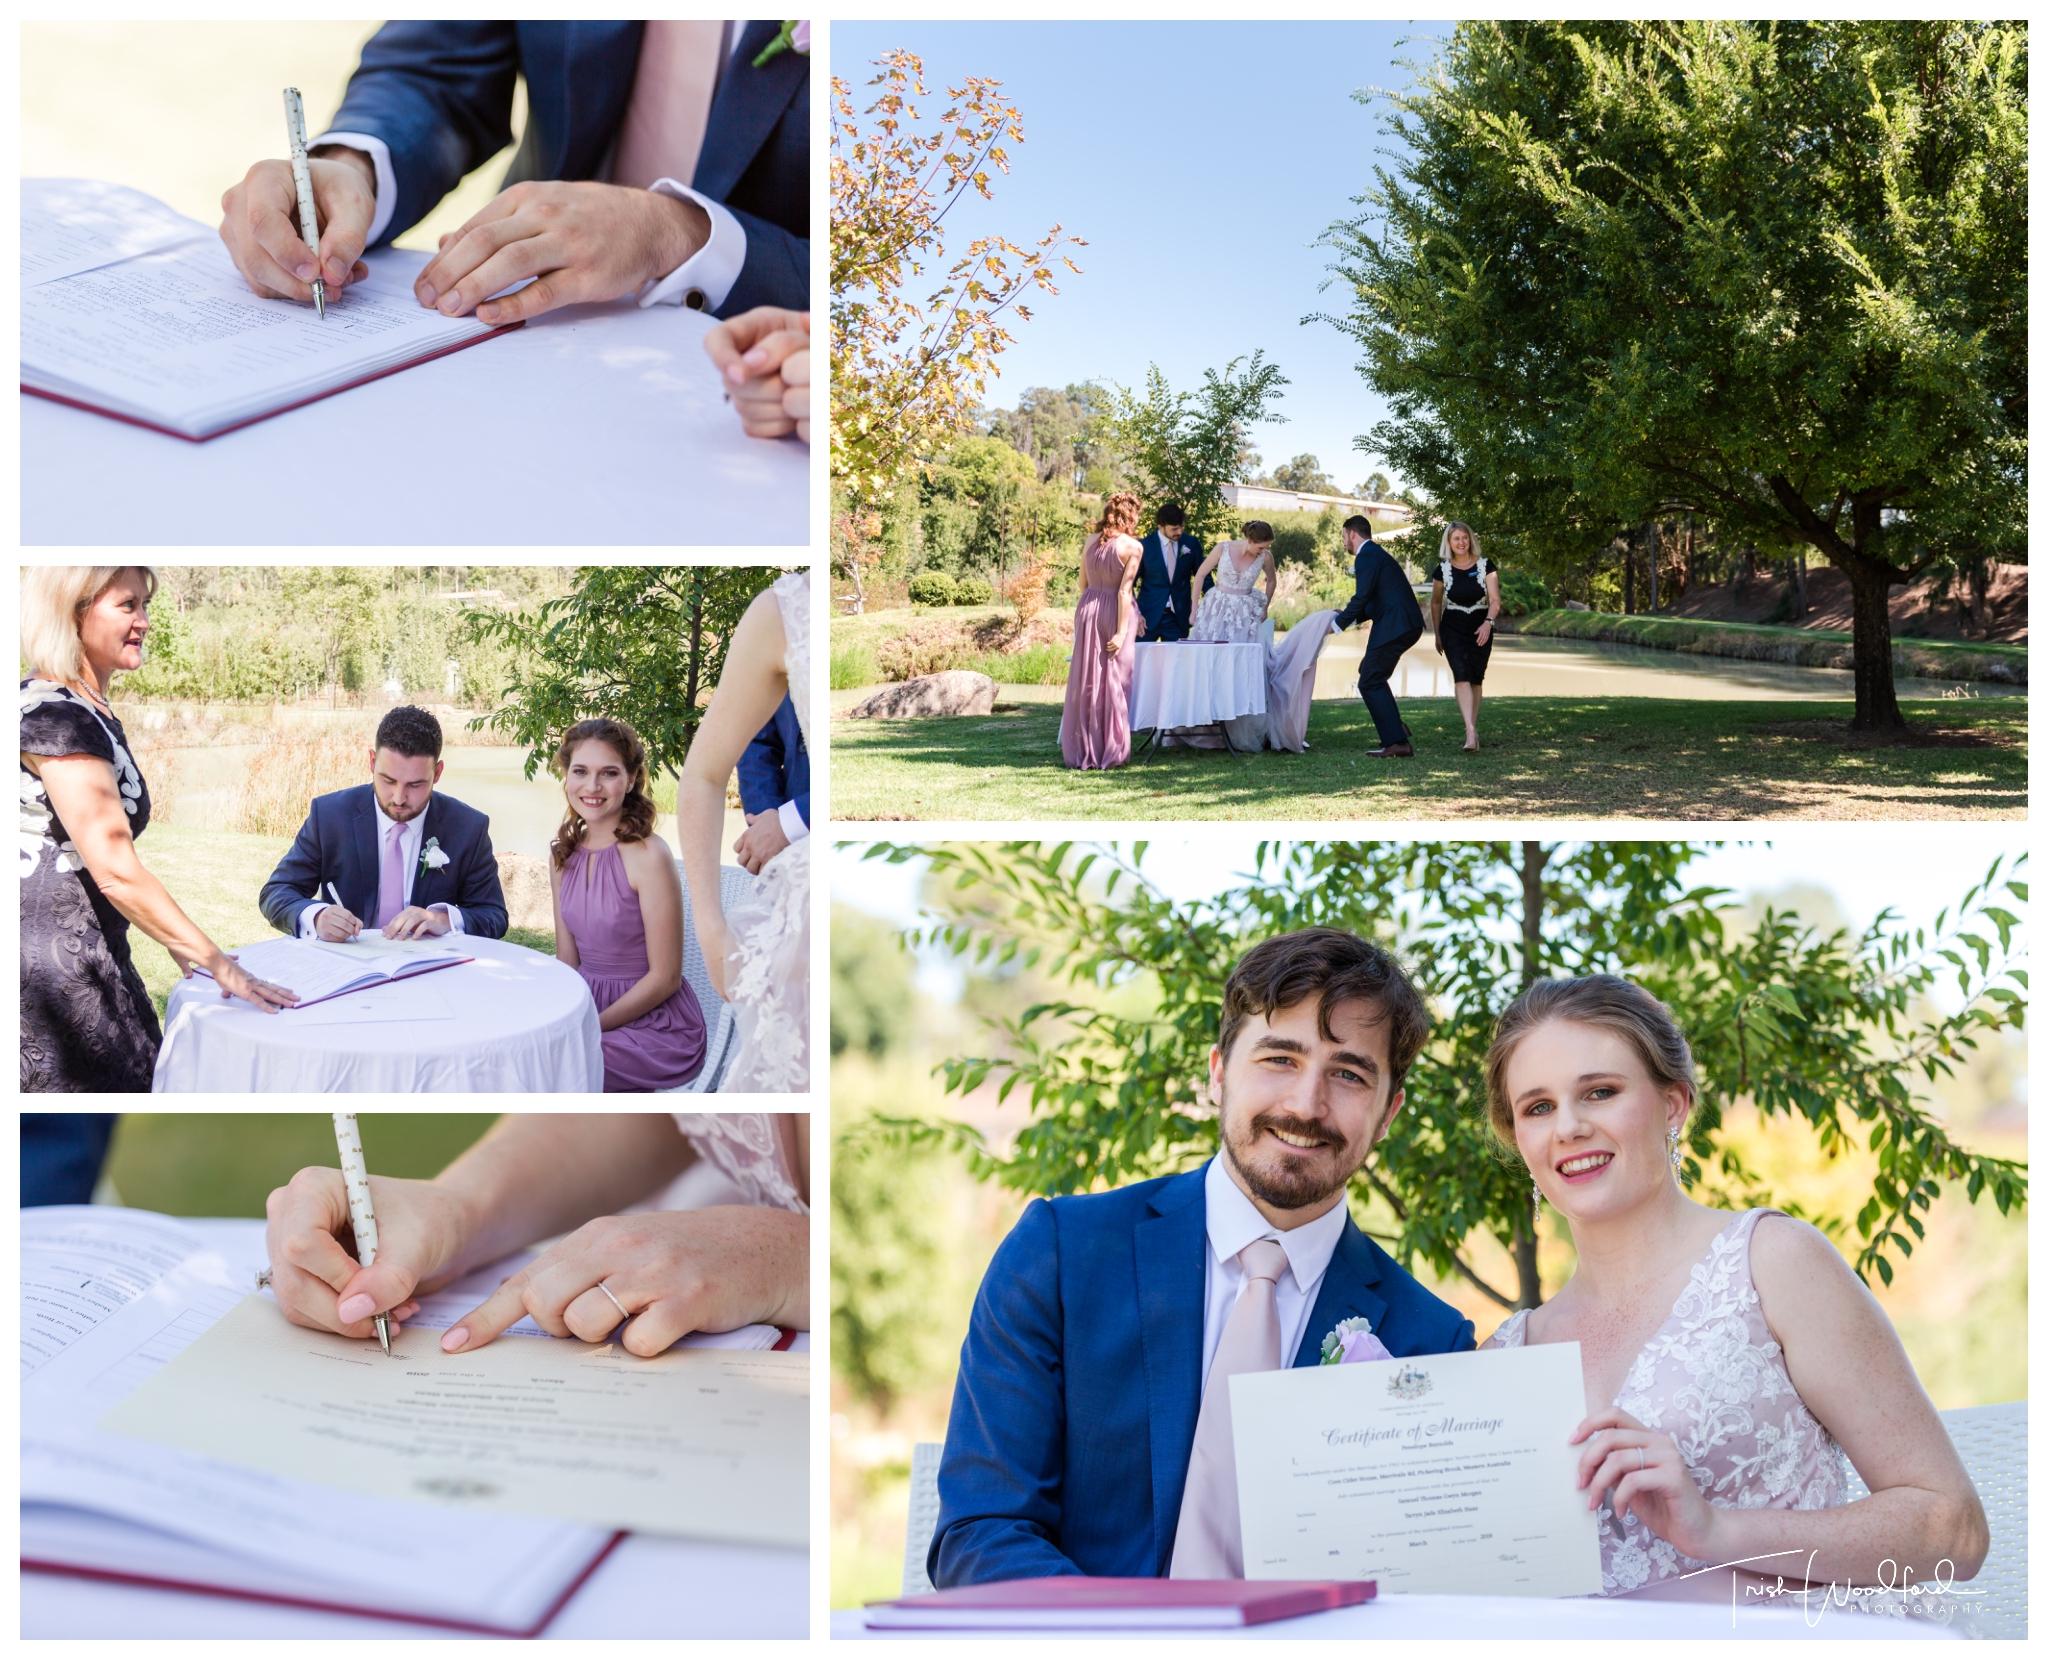 wedding-ceremony-core-cider-house